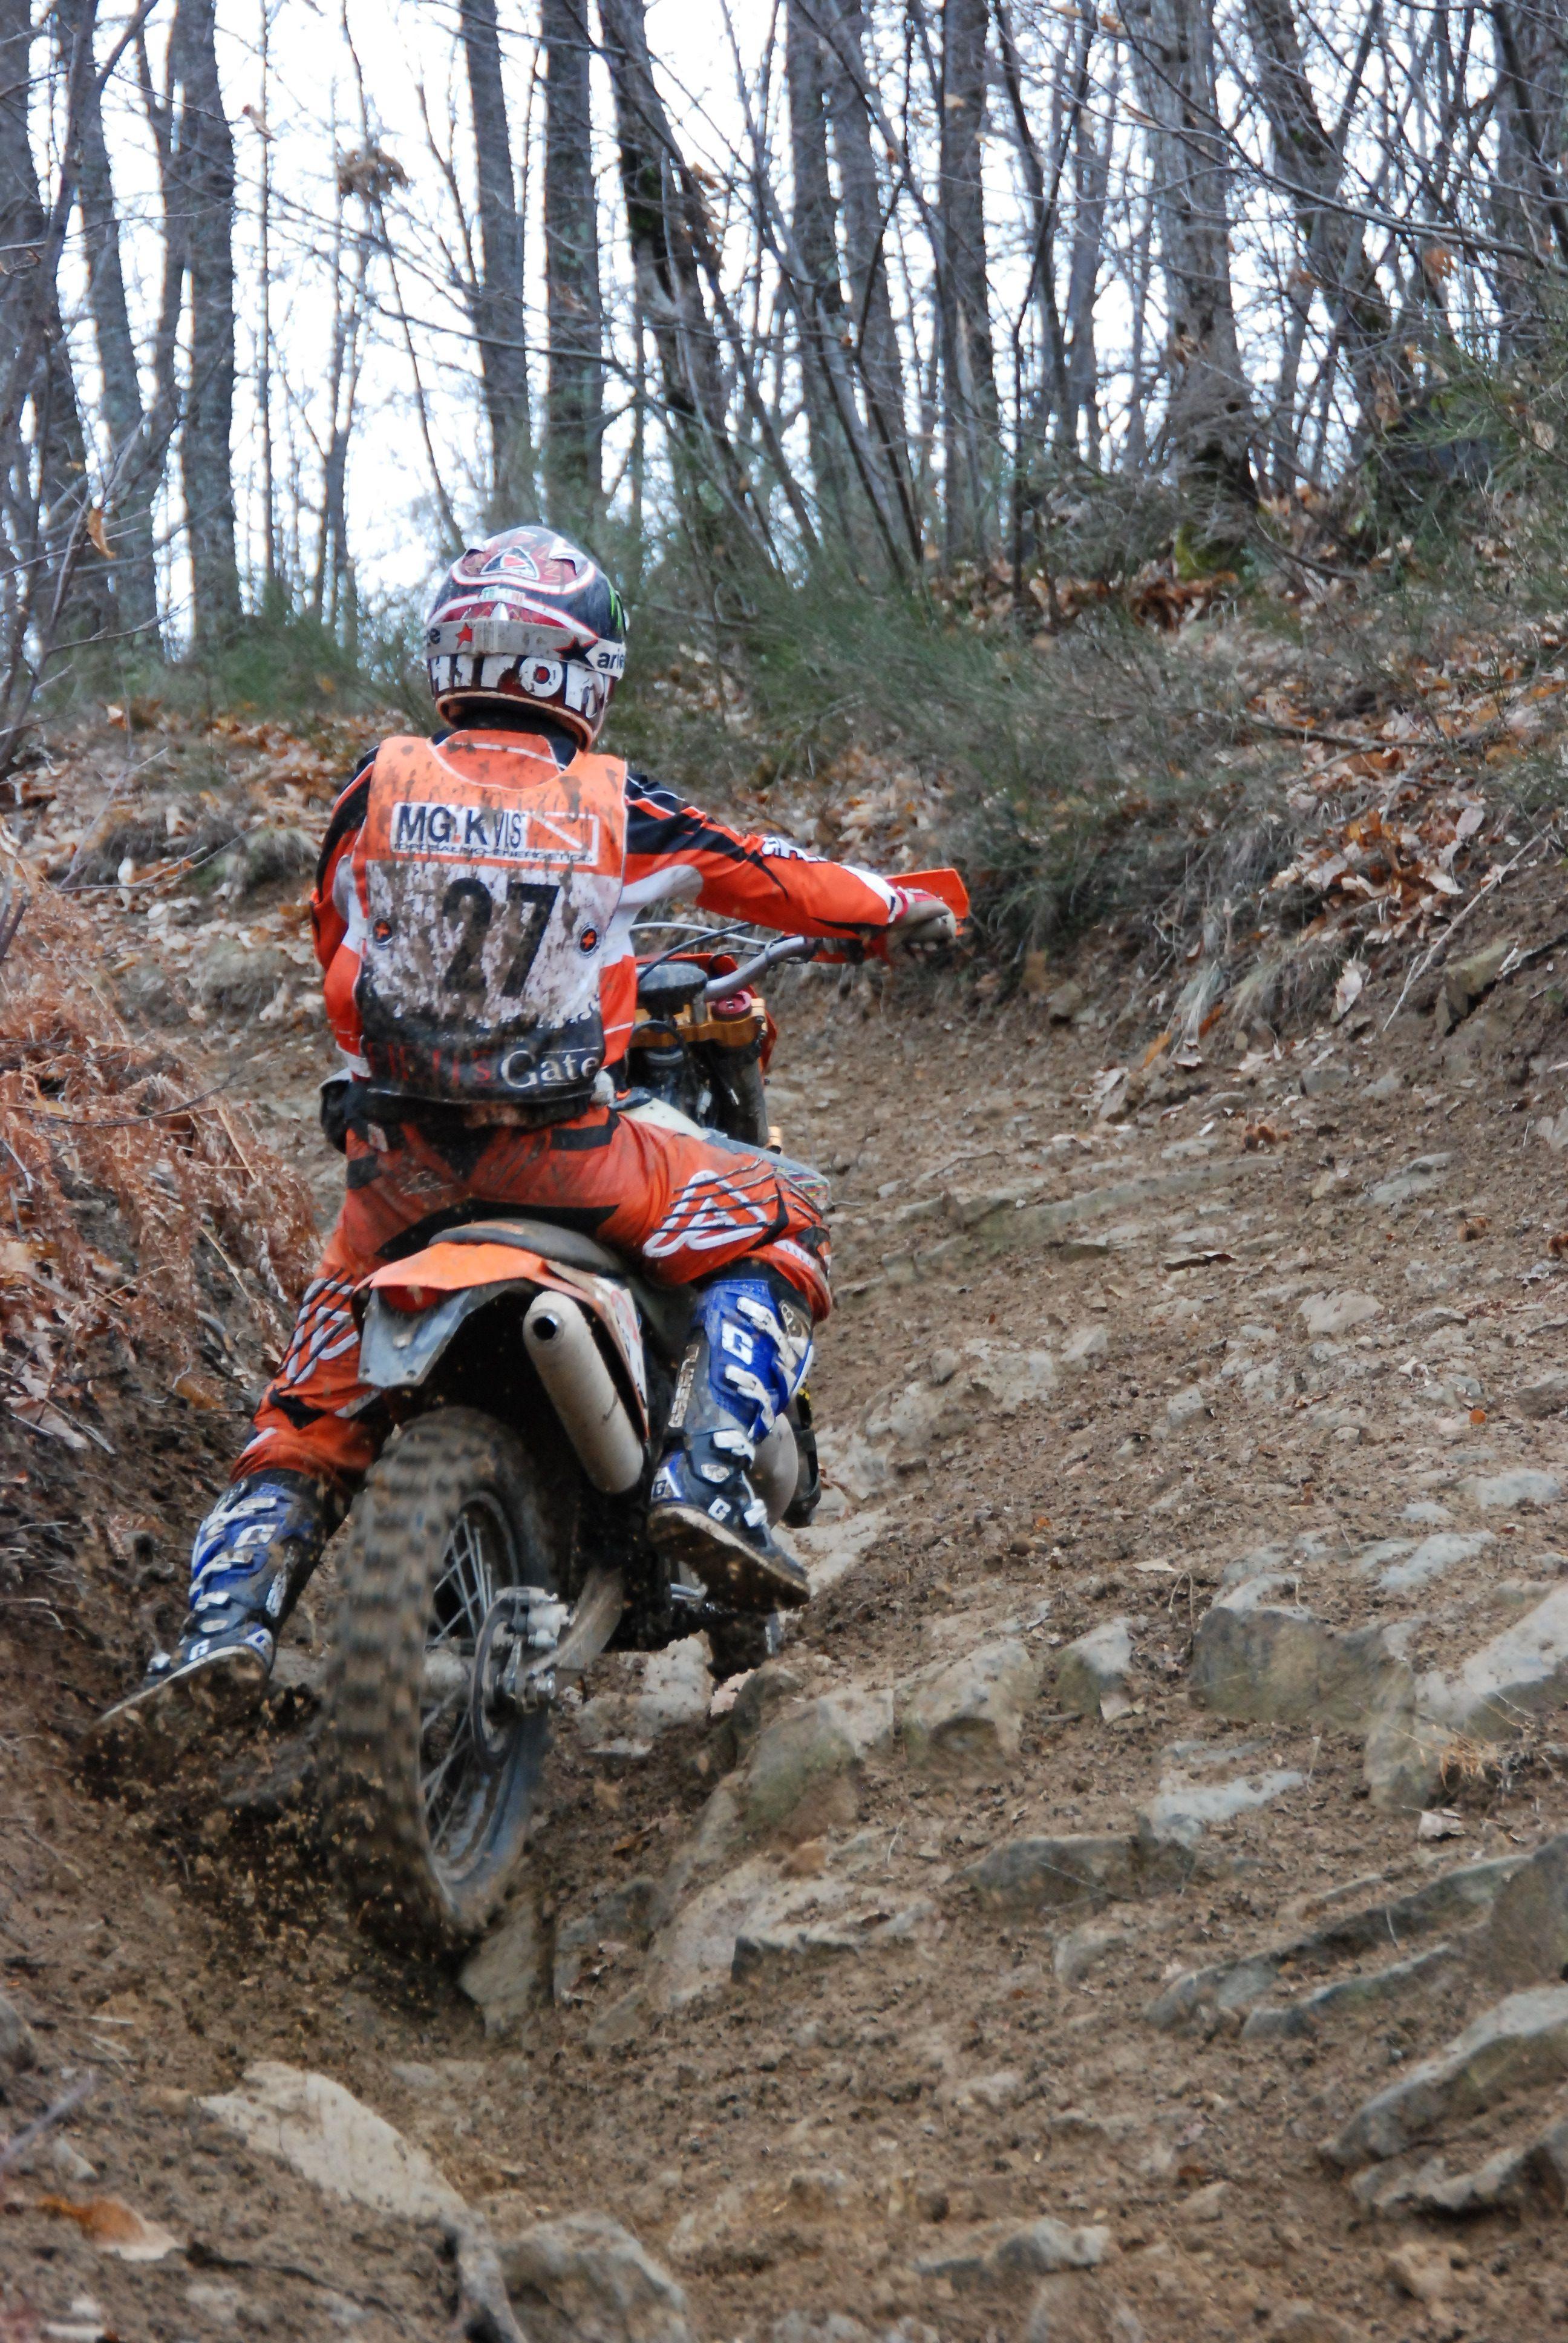 Enduro With Images Motocross Bikes Enduro Motorcycle